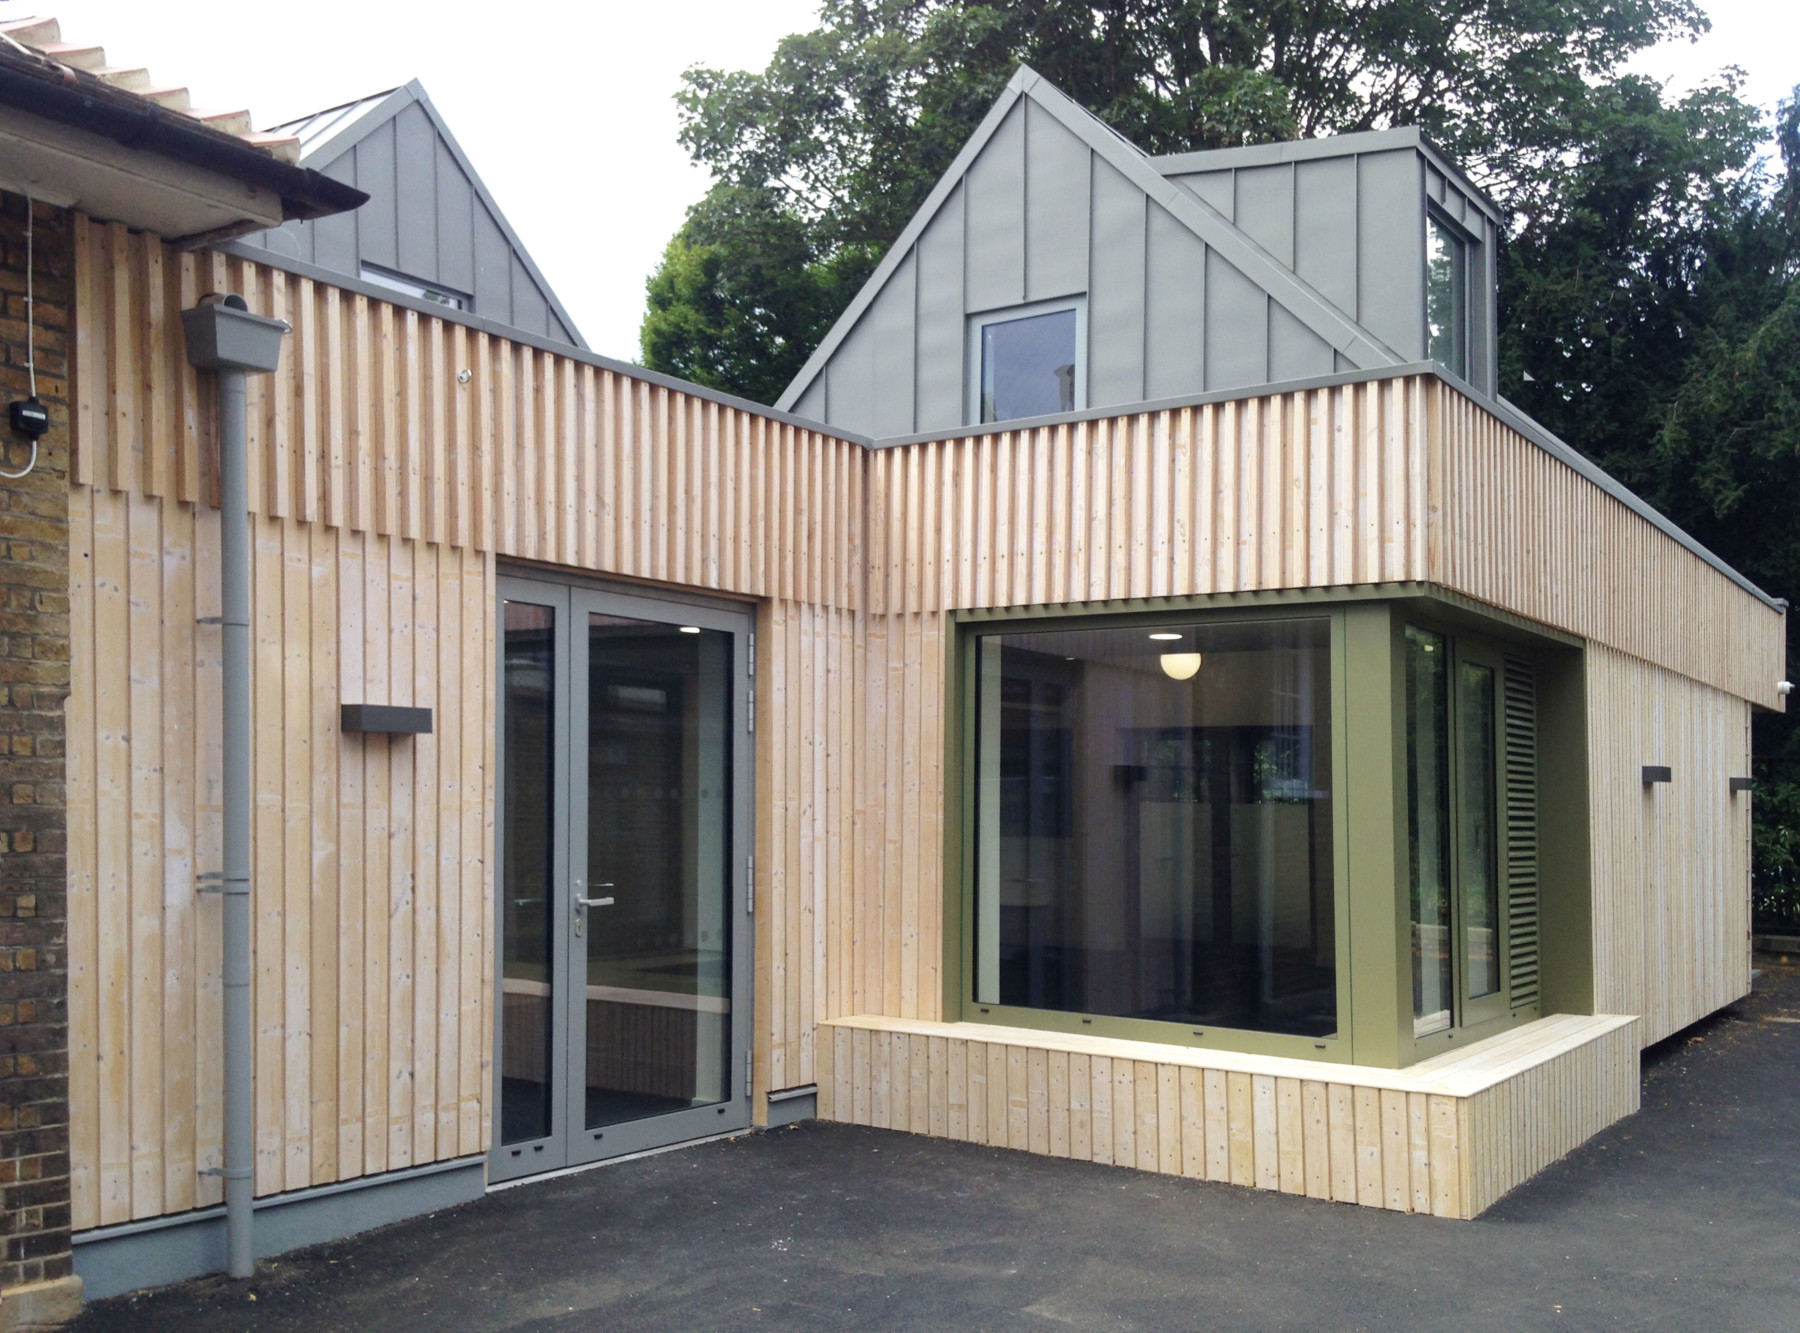 Sarah-Wigglesworth-Architects Kingsgate School Exterior 3600